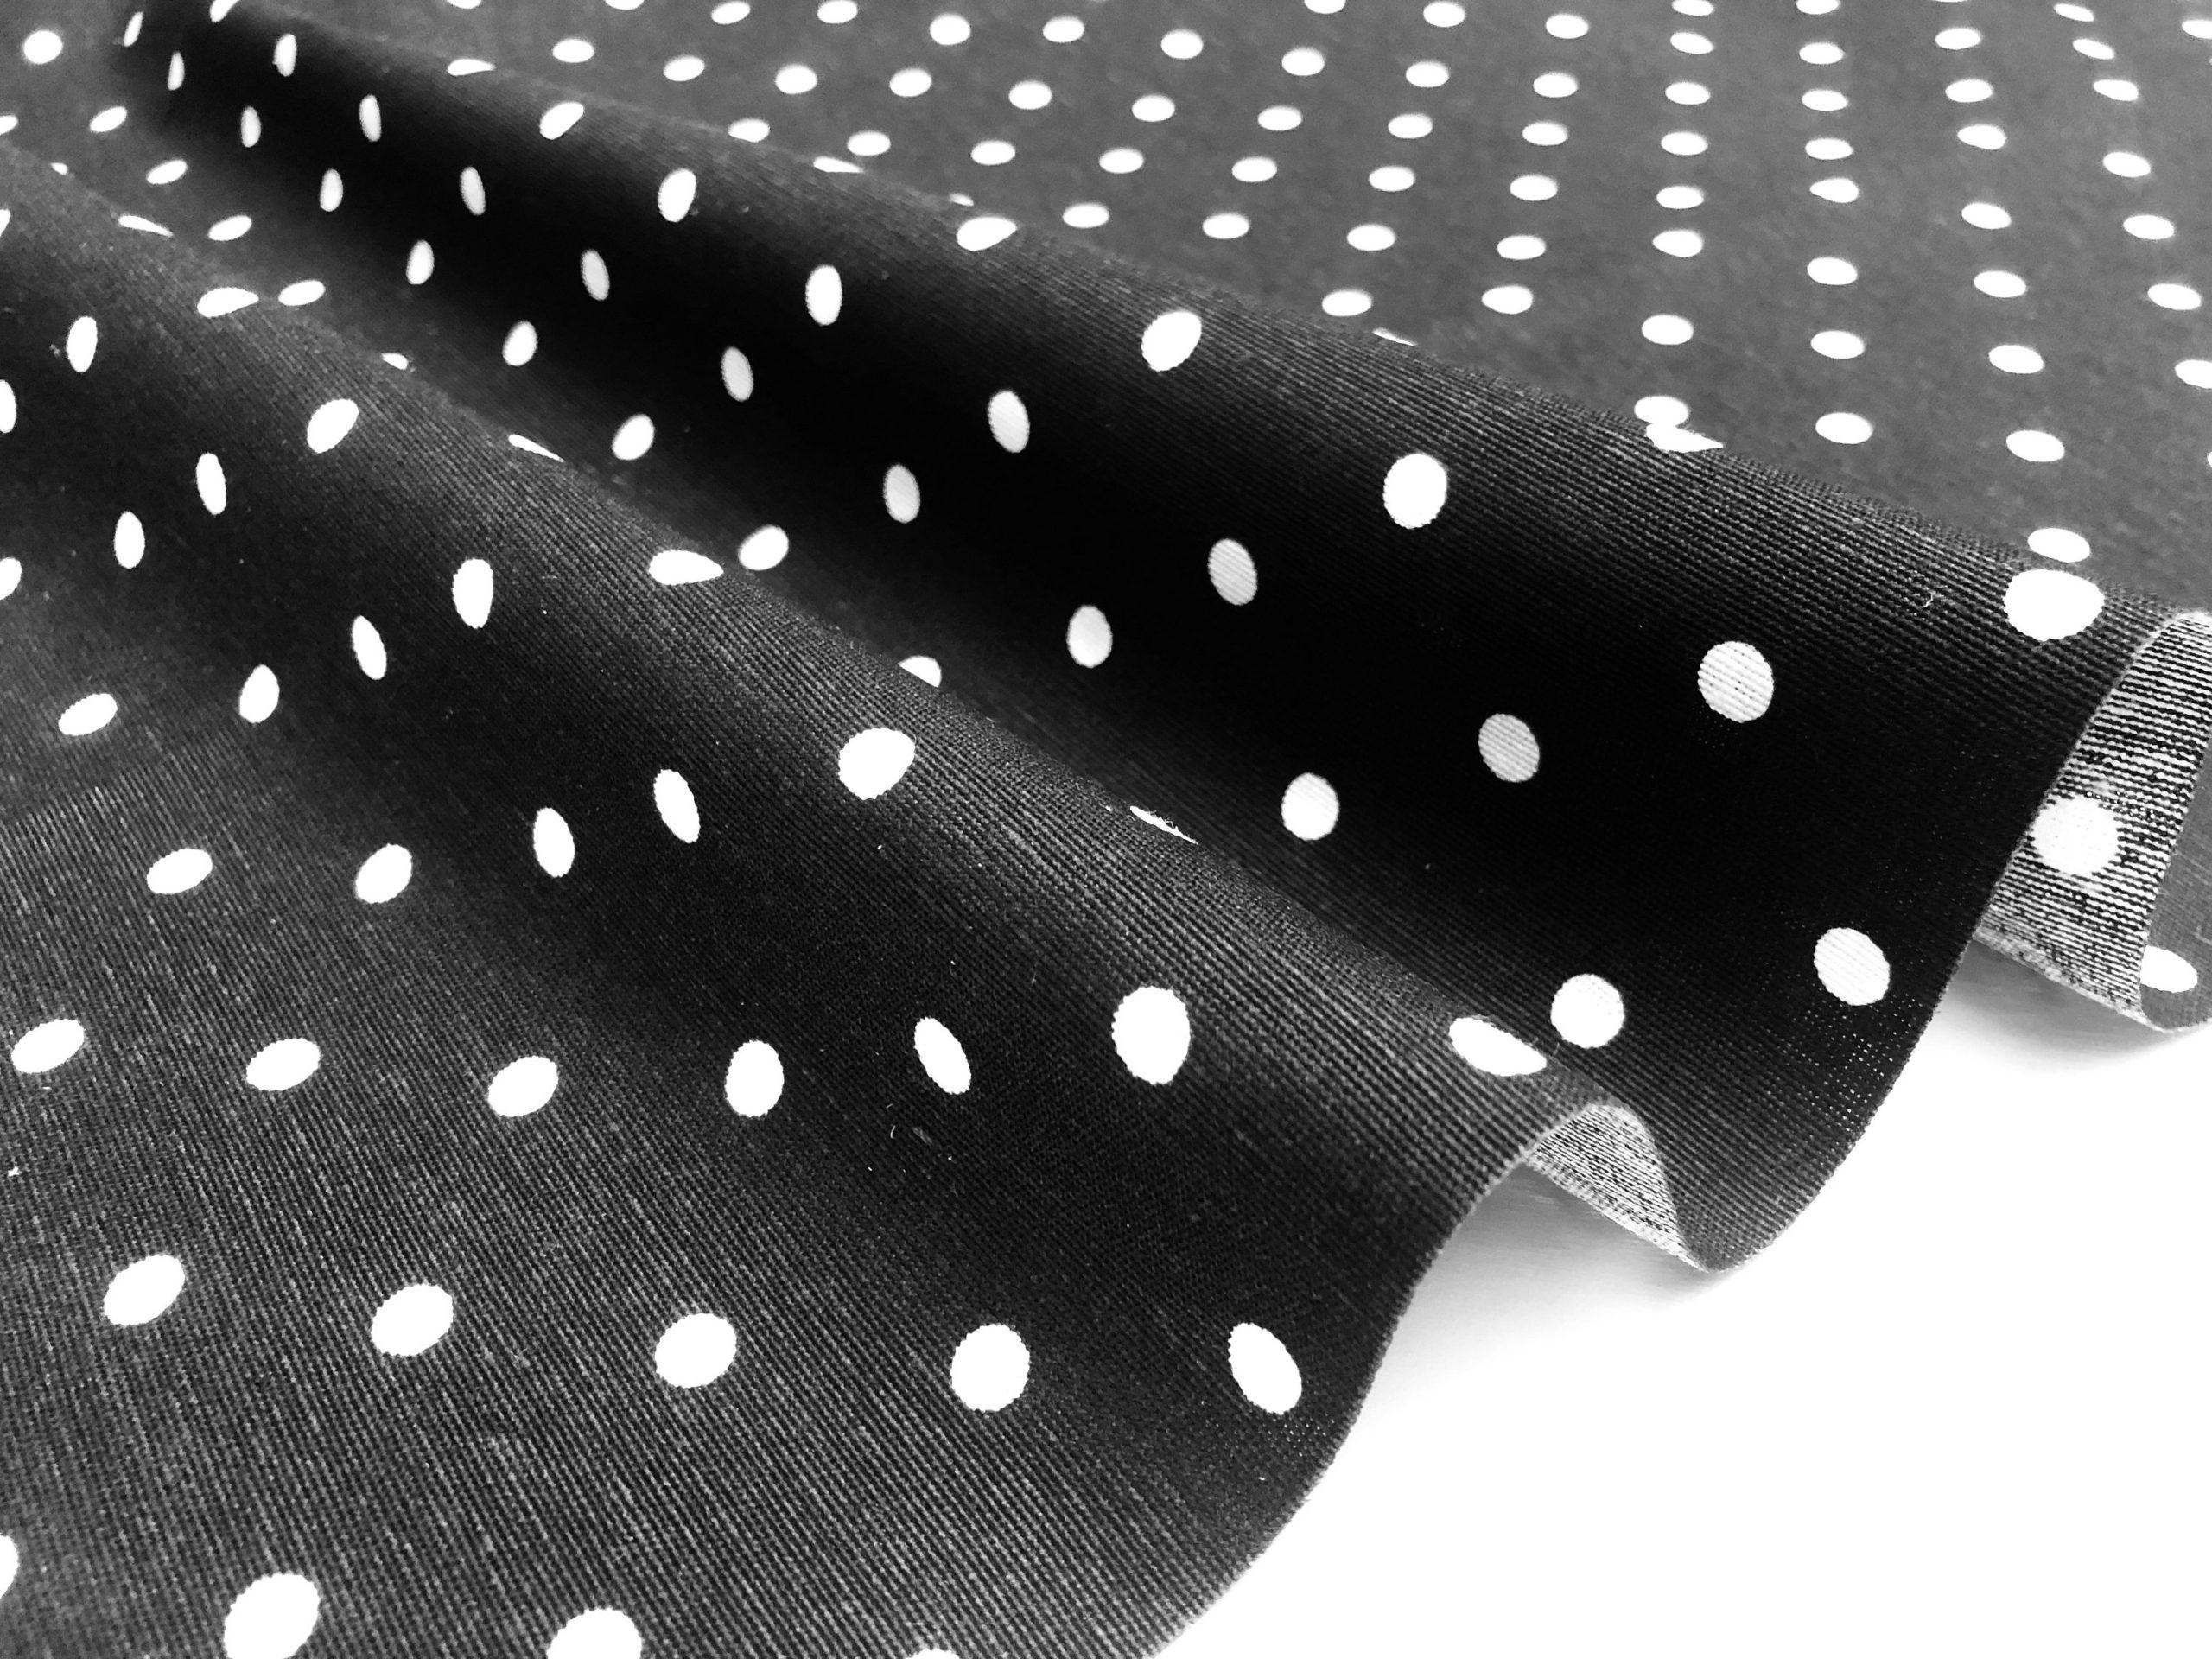 BLACK Polka Dot Fabric White Spots Dots PolyCotton Material Classic Chic Textile Home Decor Dress Curtains – 55''/140cm Wide Canvas